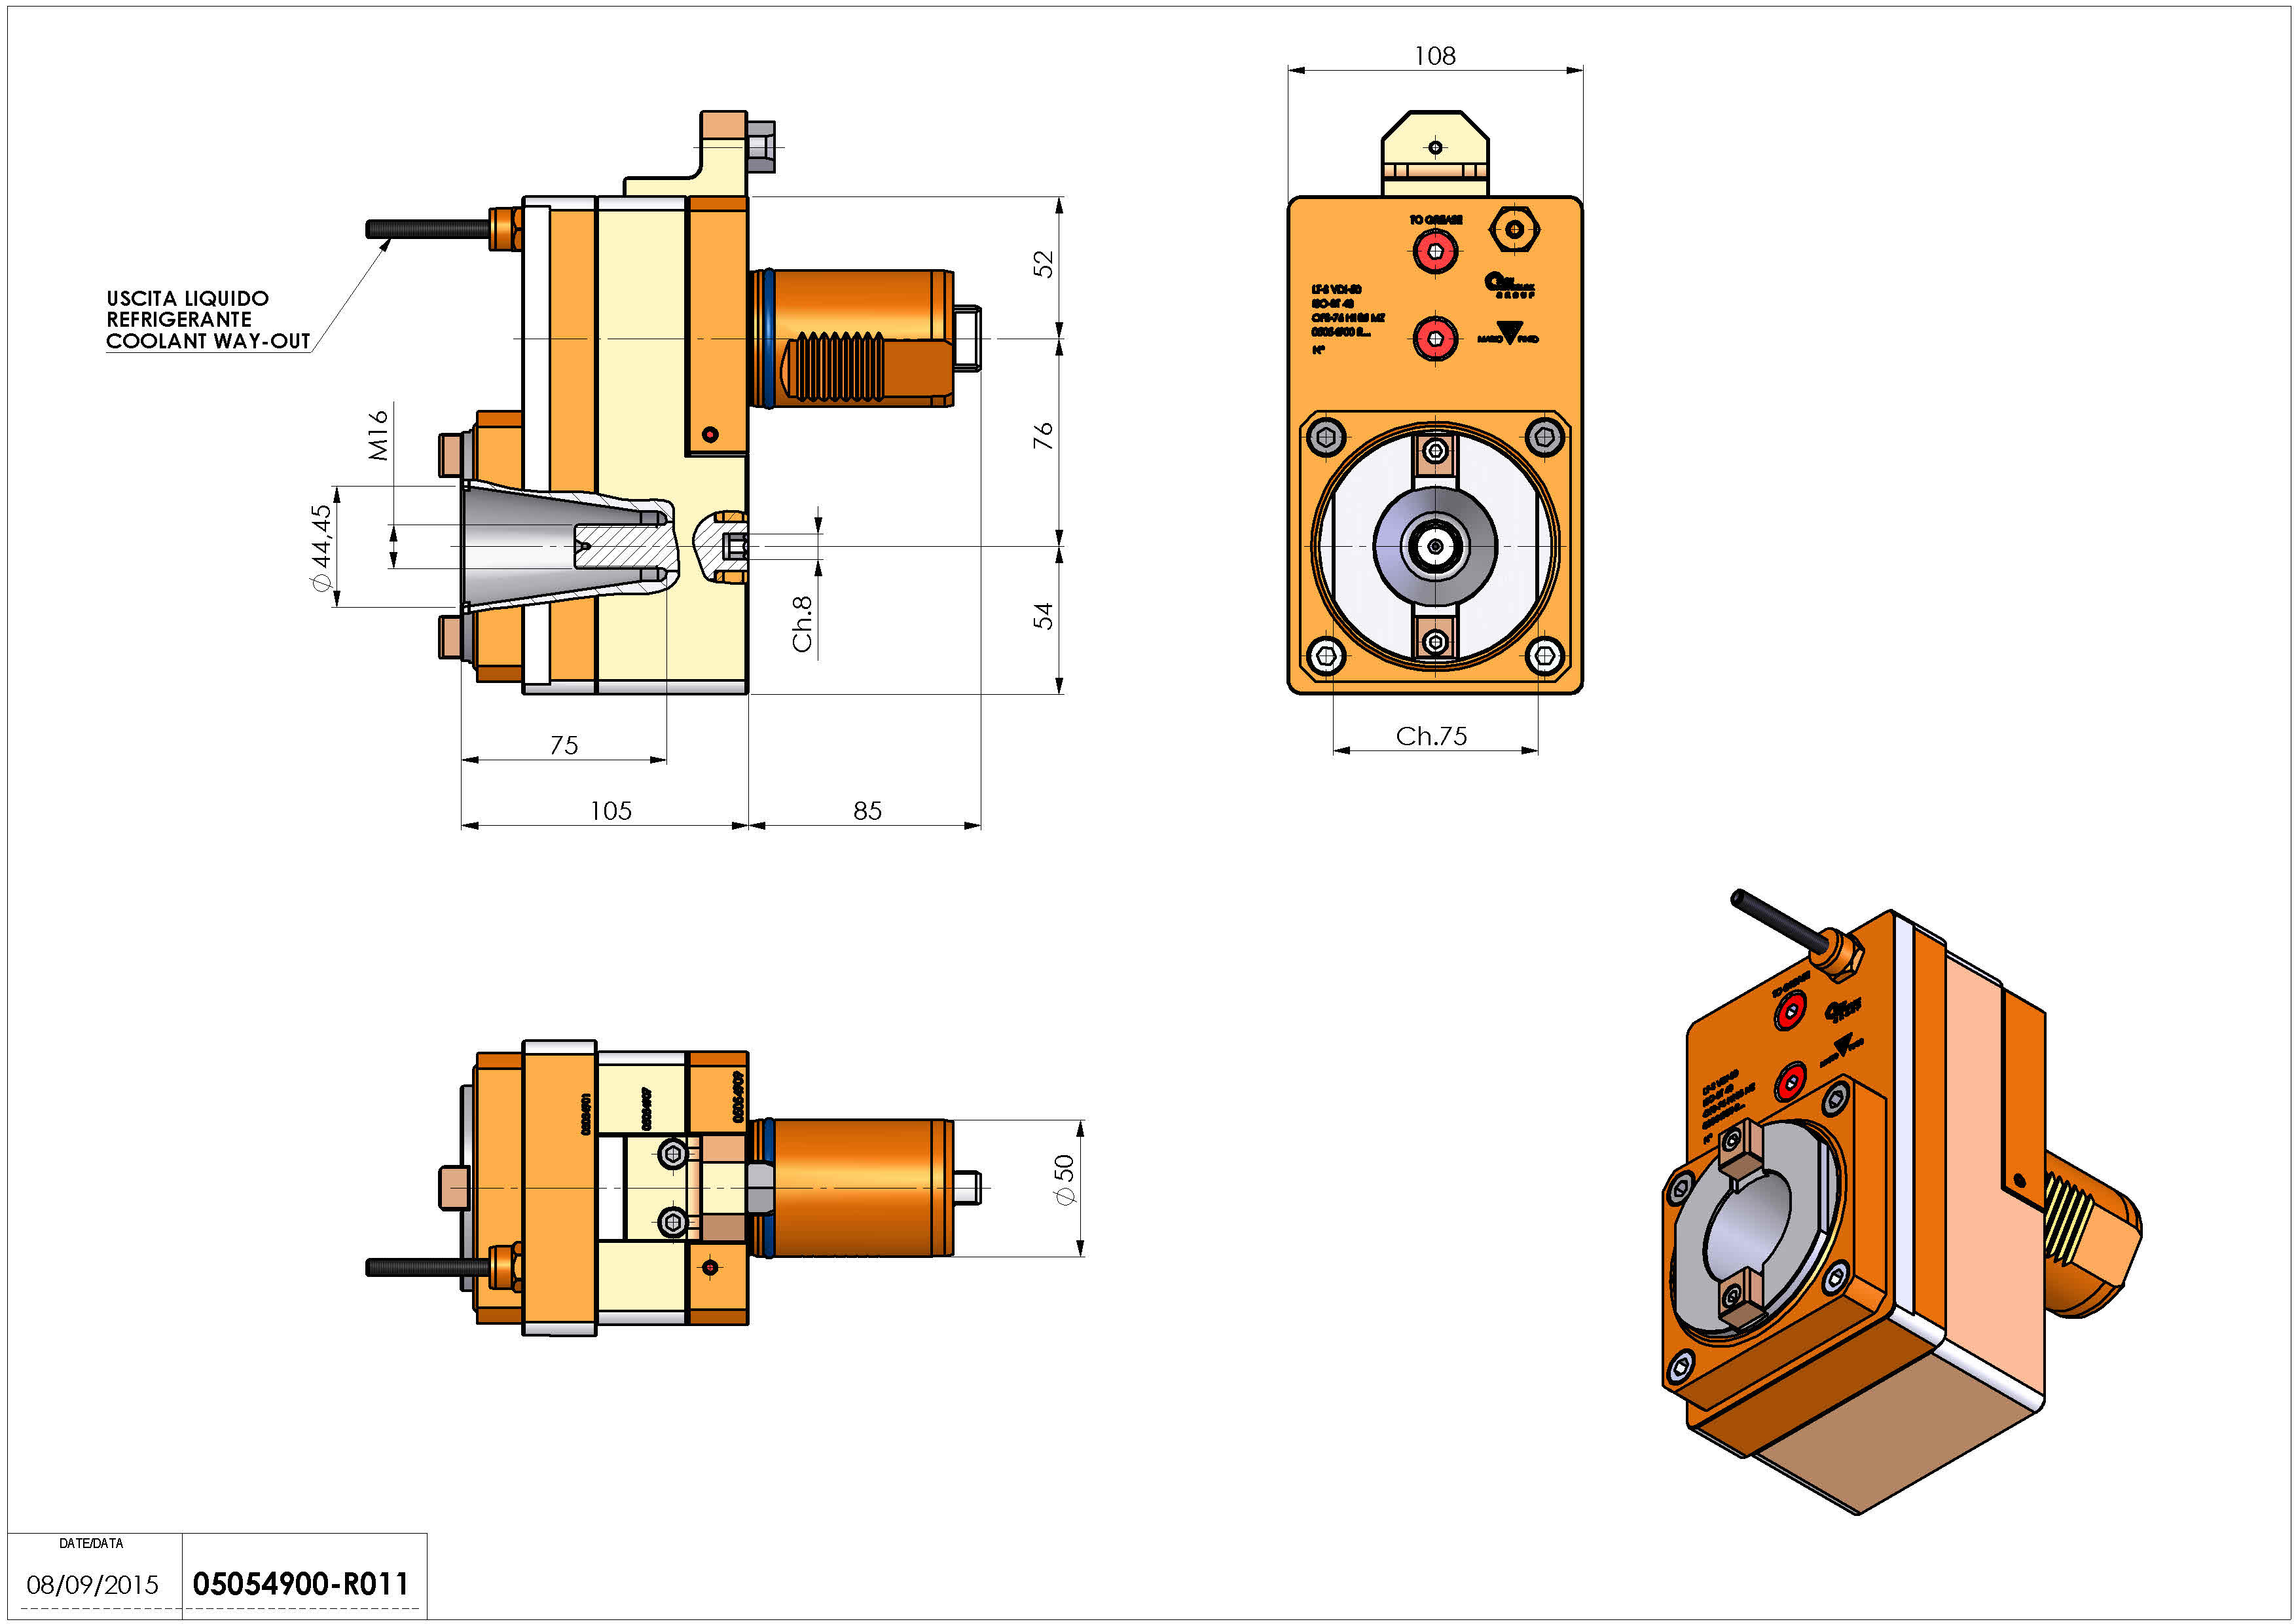 Technical image - LT-S VDI50 ISOBT40 OFS76H105MZ.